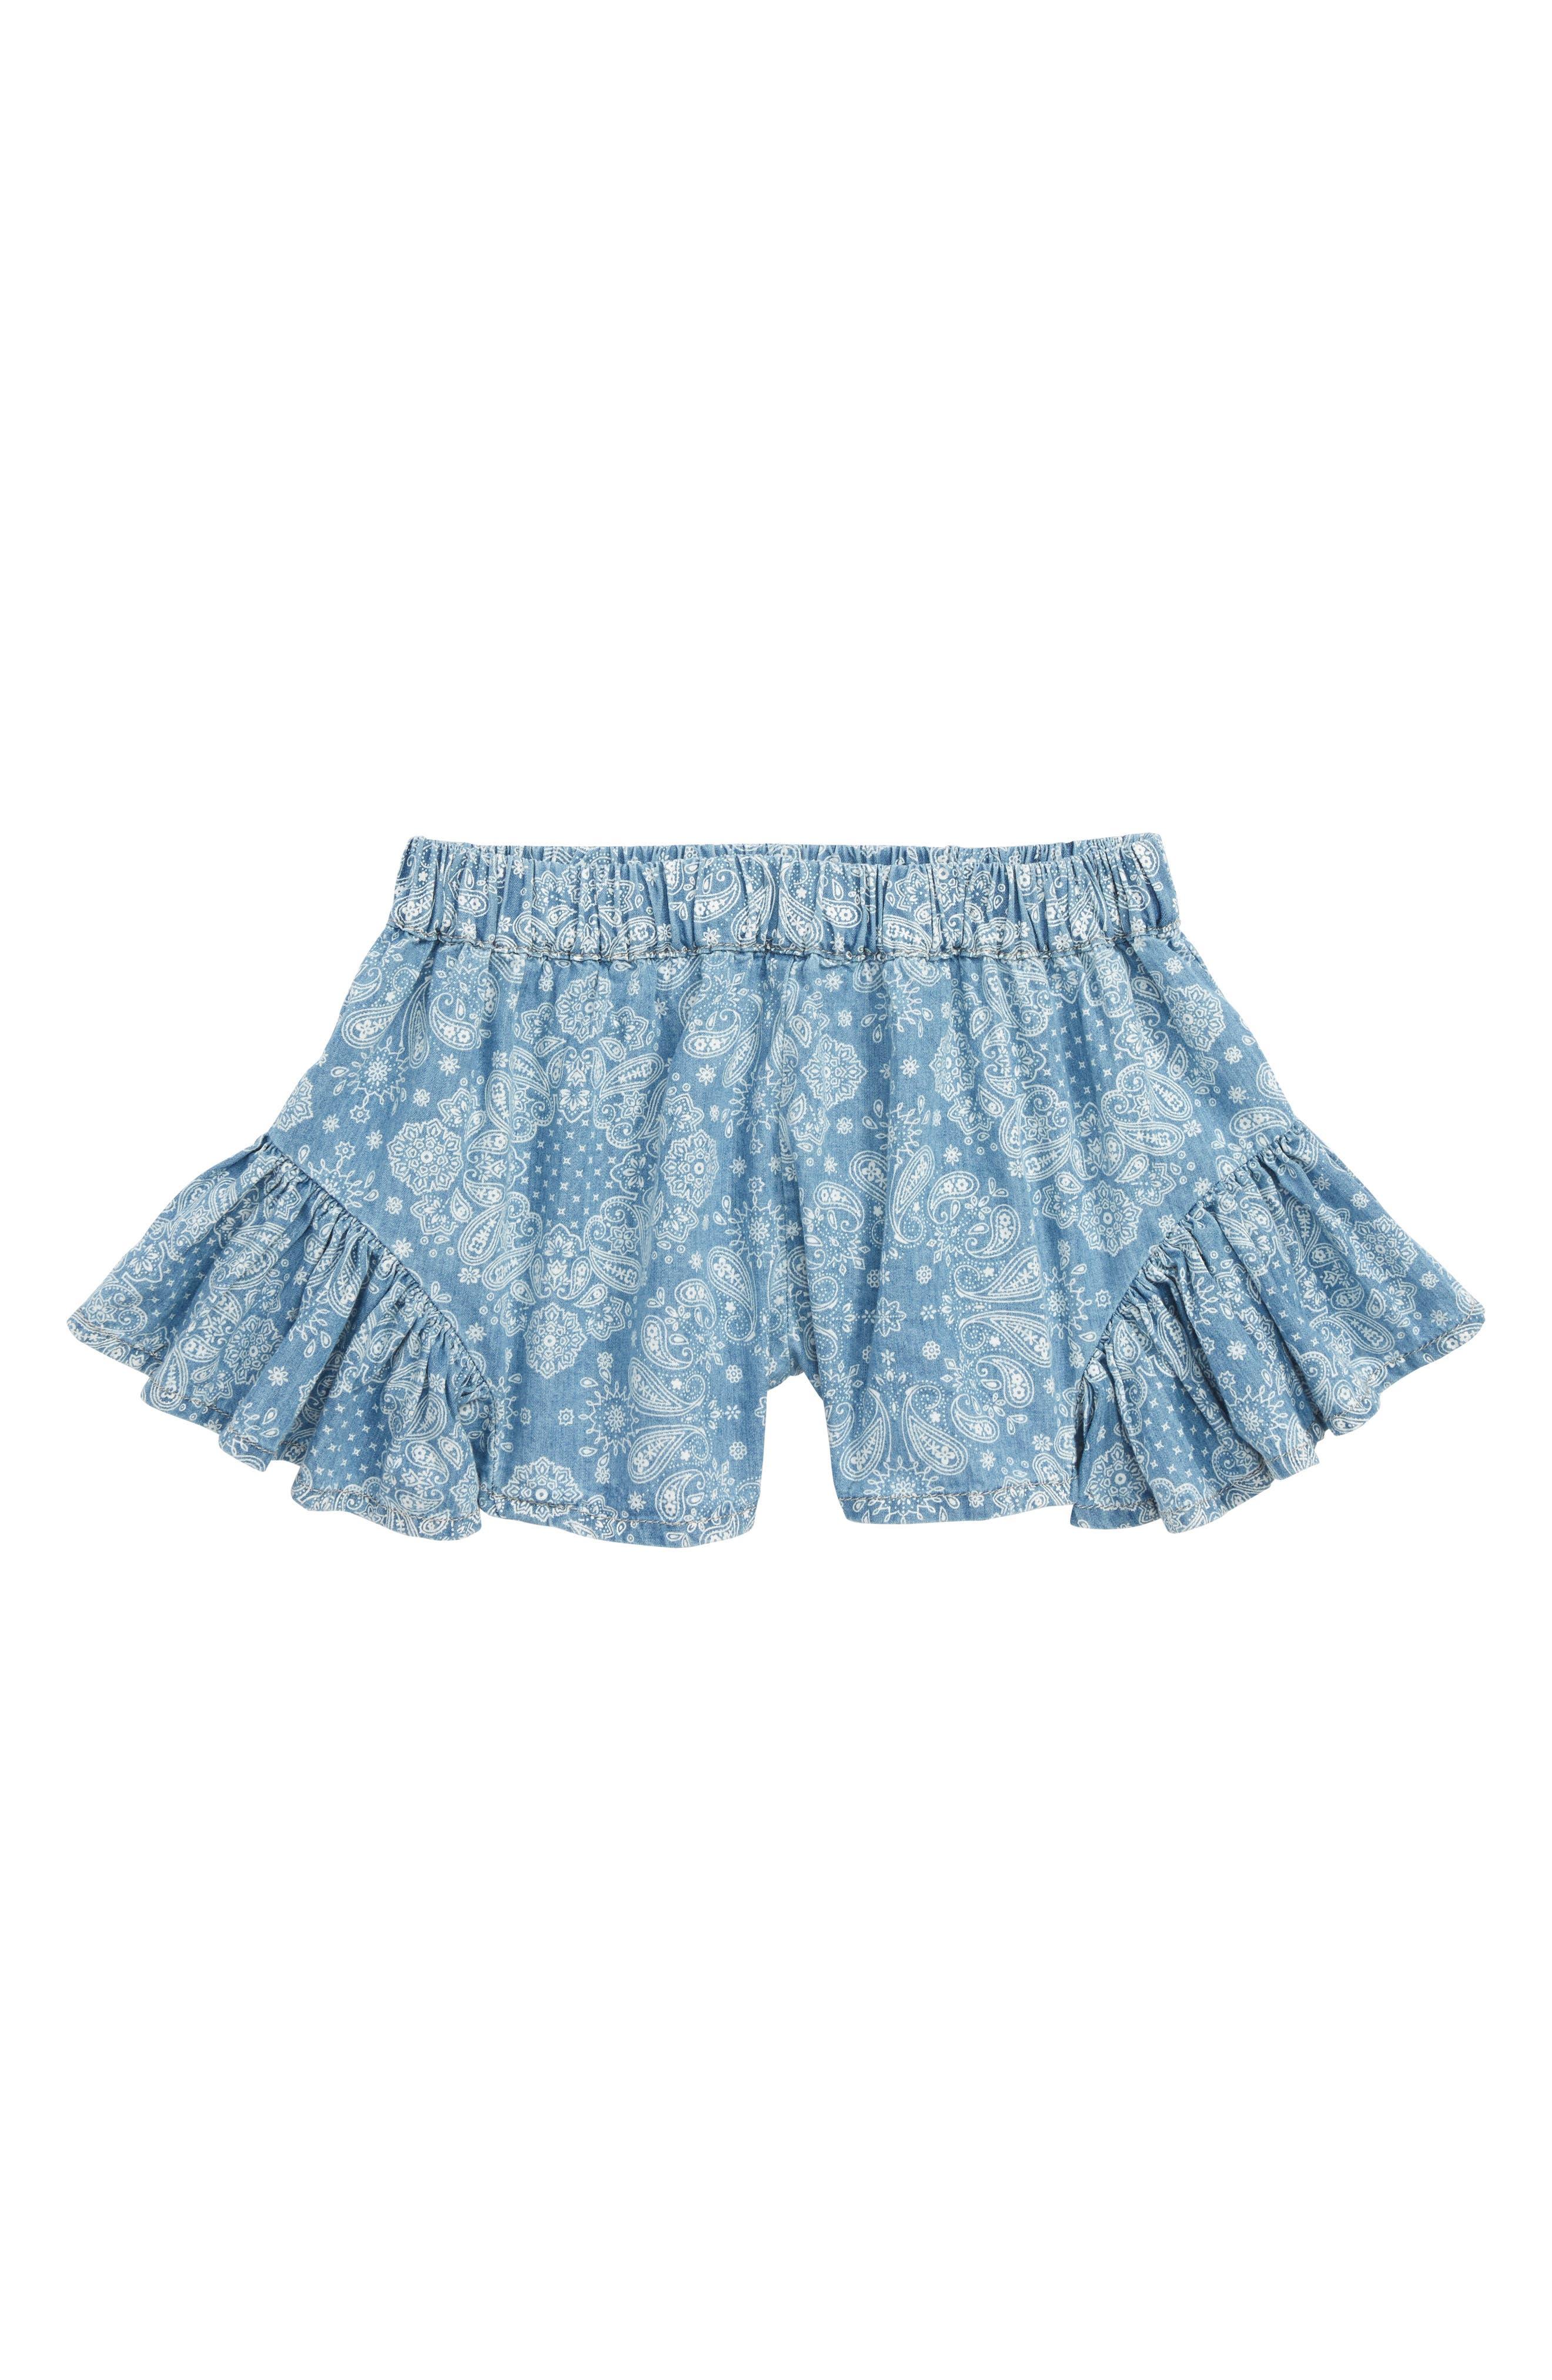 Bandana Print Ruffle Shorts,                             Main thumbnail 1, color,                             450